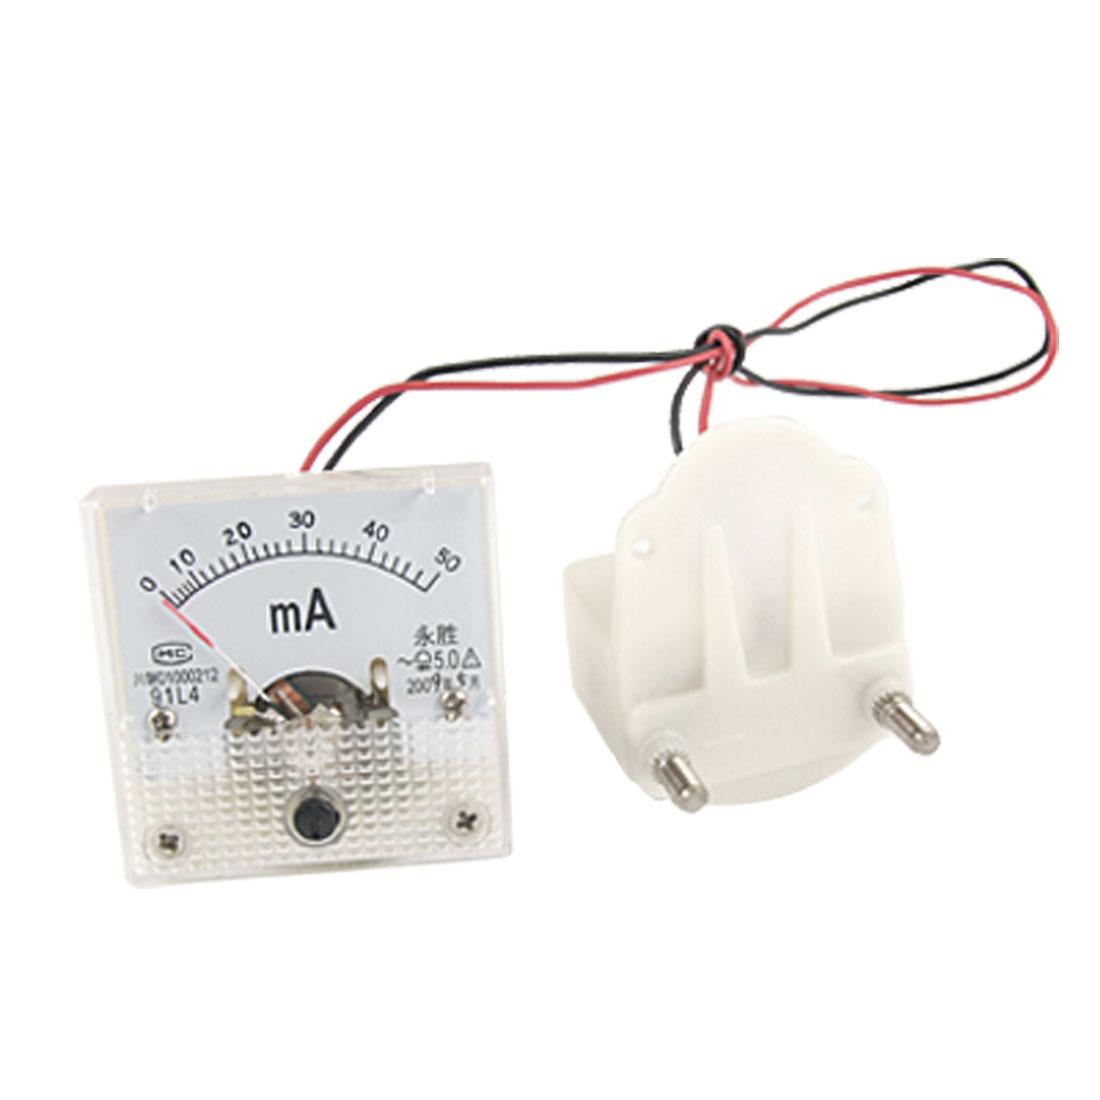 Plastic Square 91L4 AC 0-50mA Analog Meter Ammeter